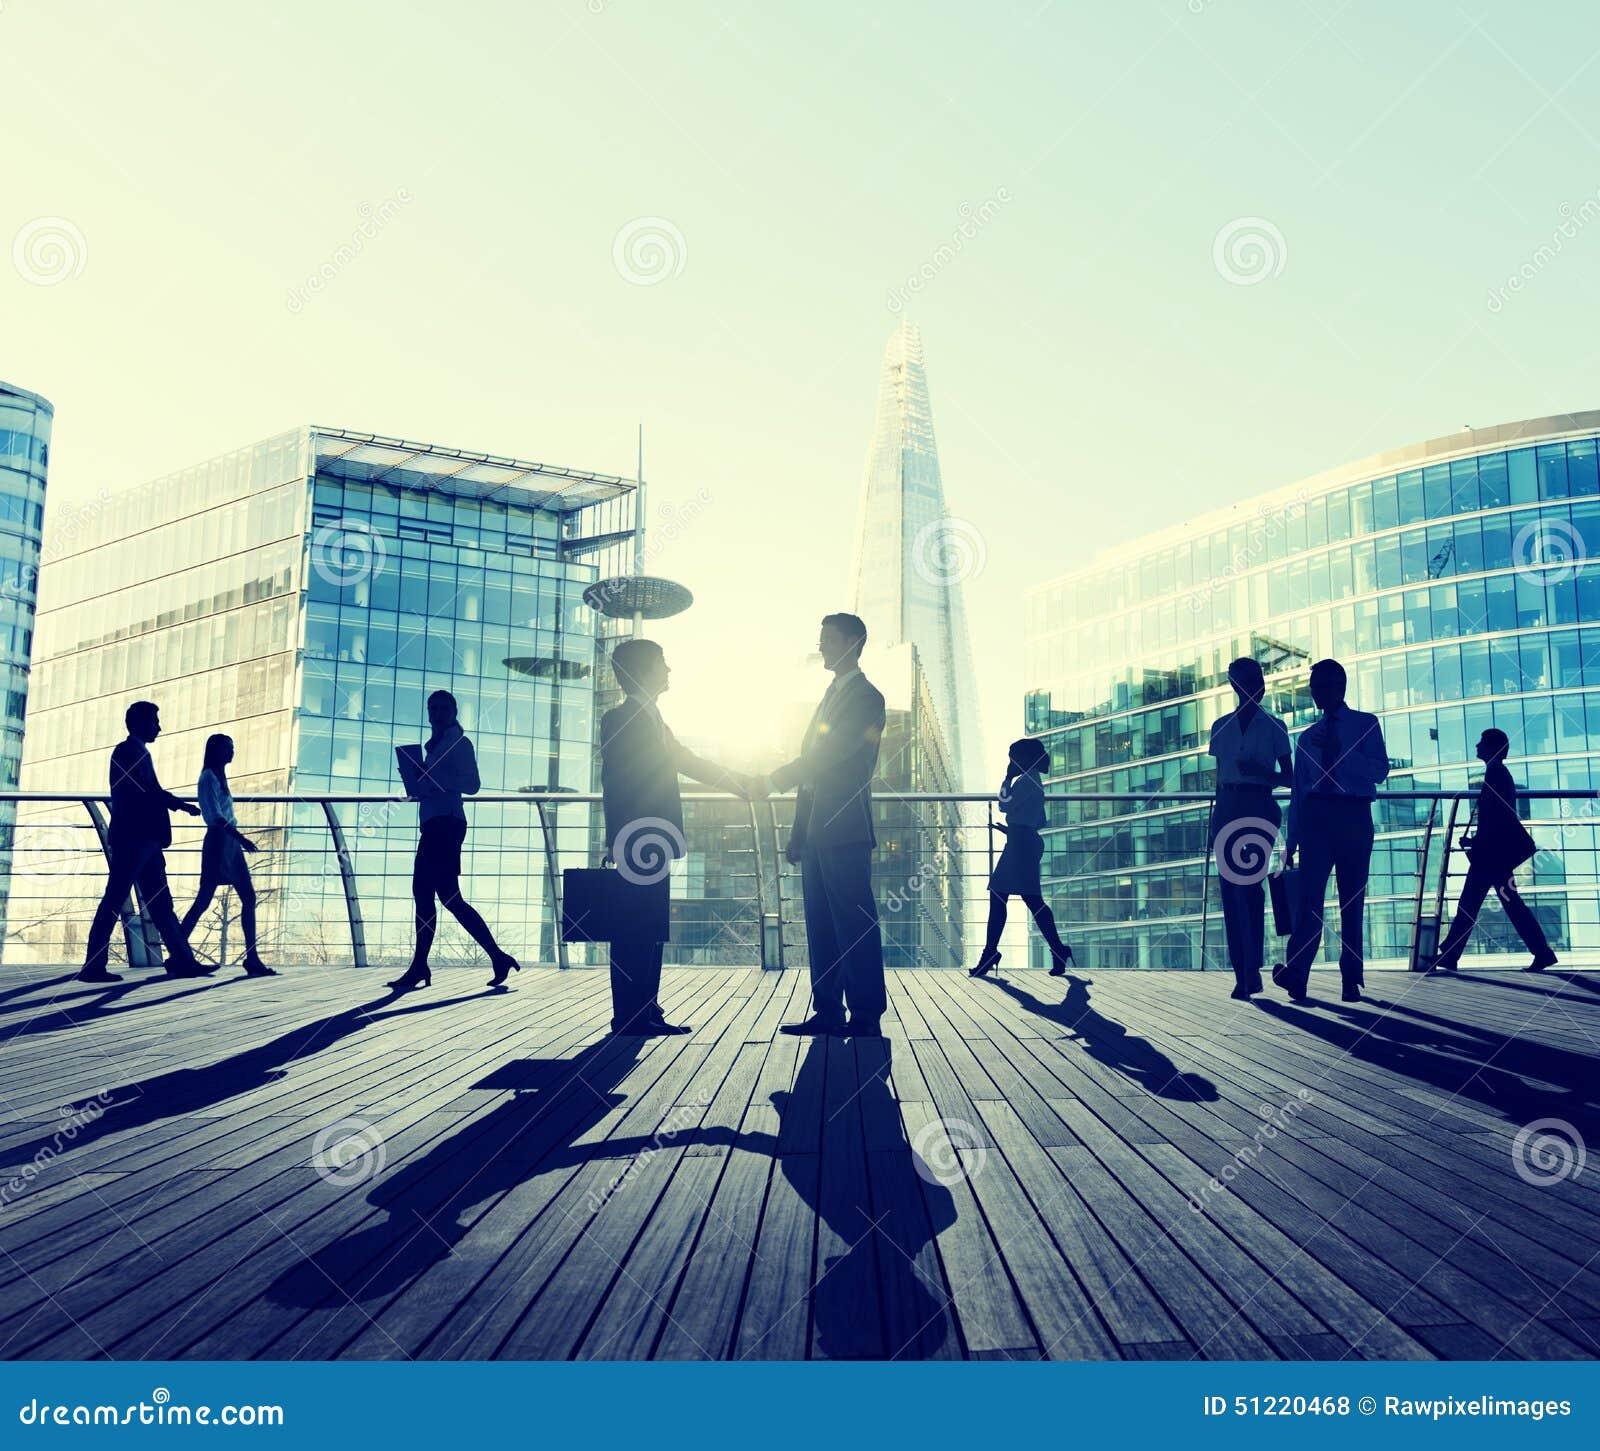 Business People Handshake Greeting Agreement Talking Deal